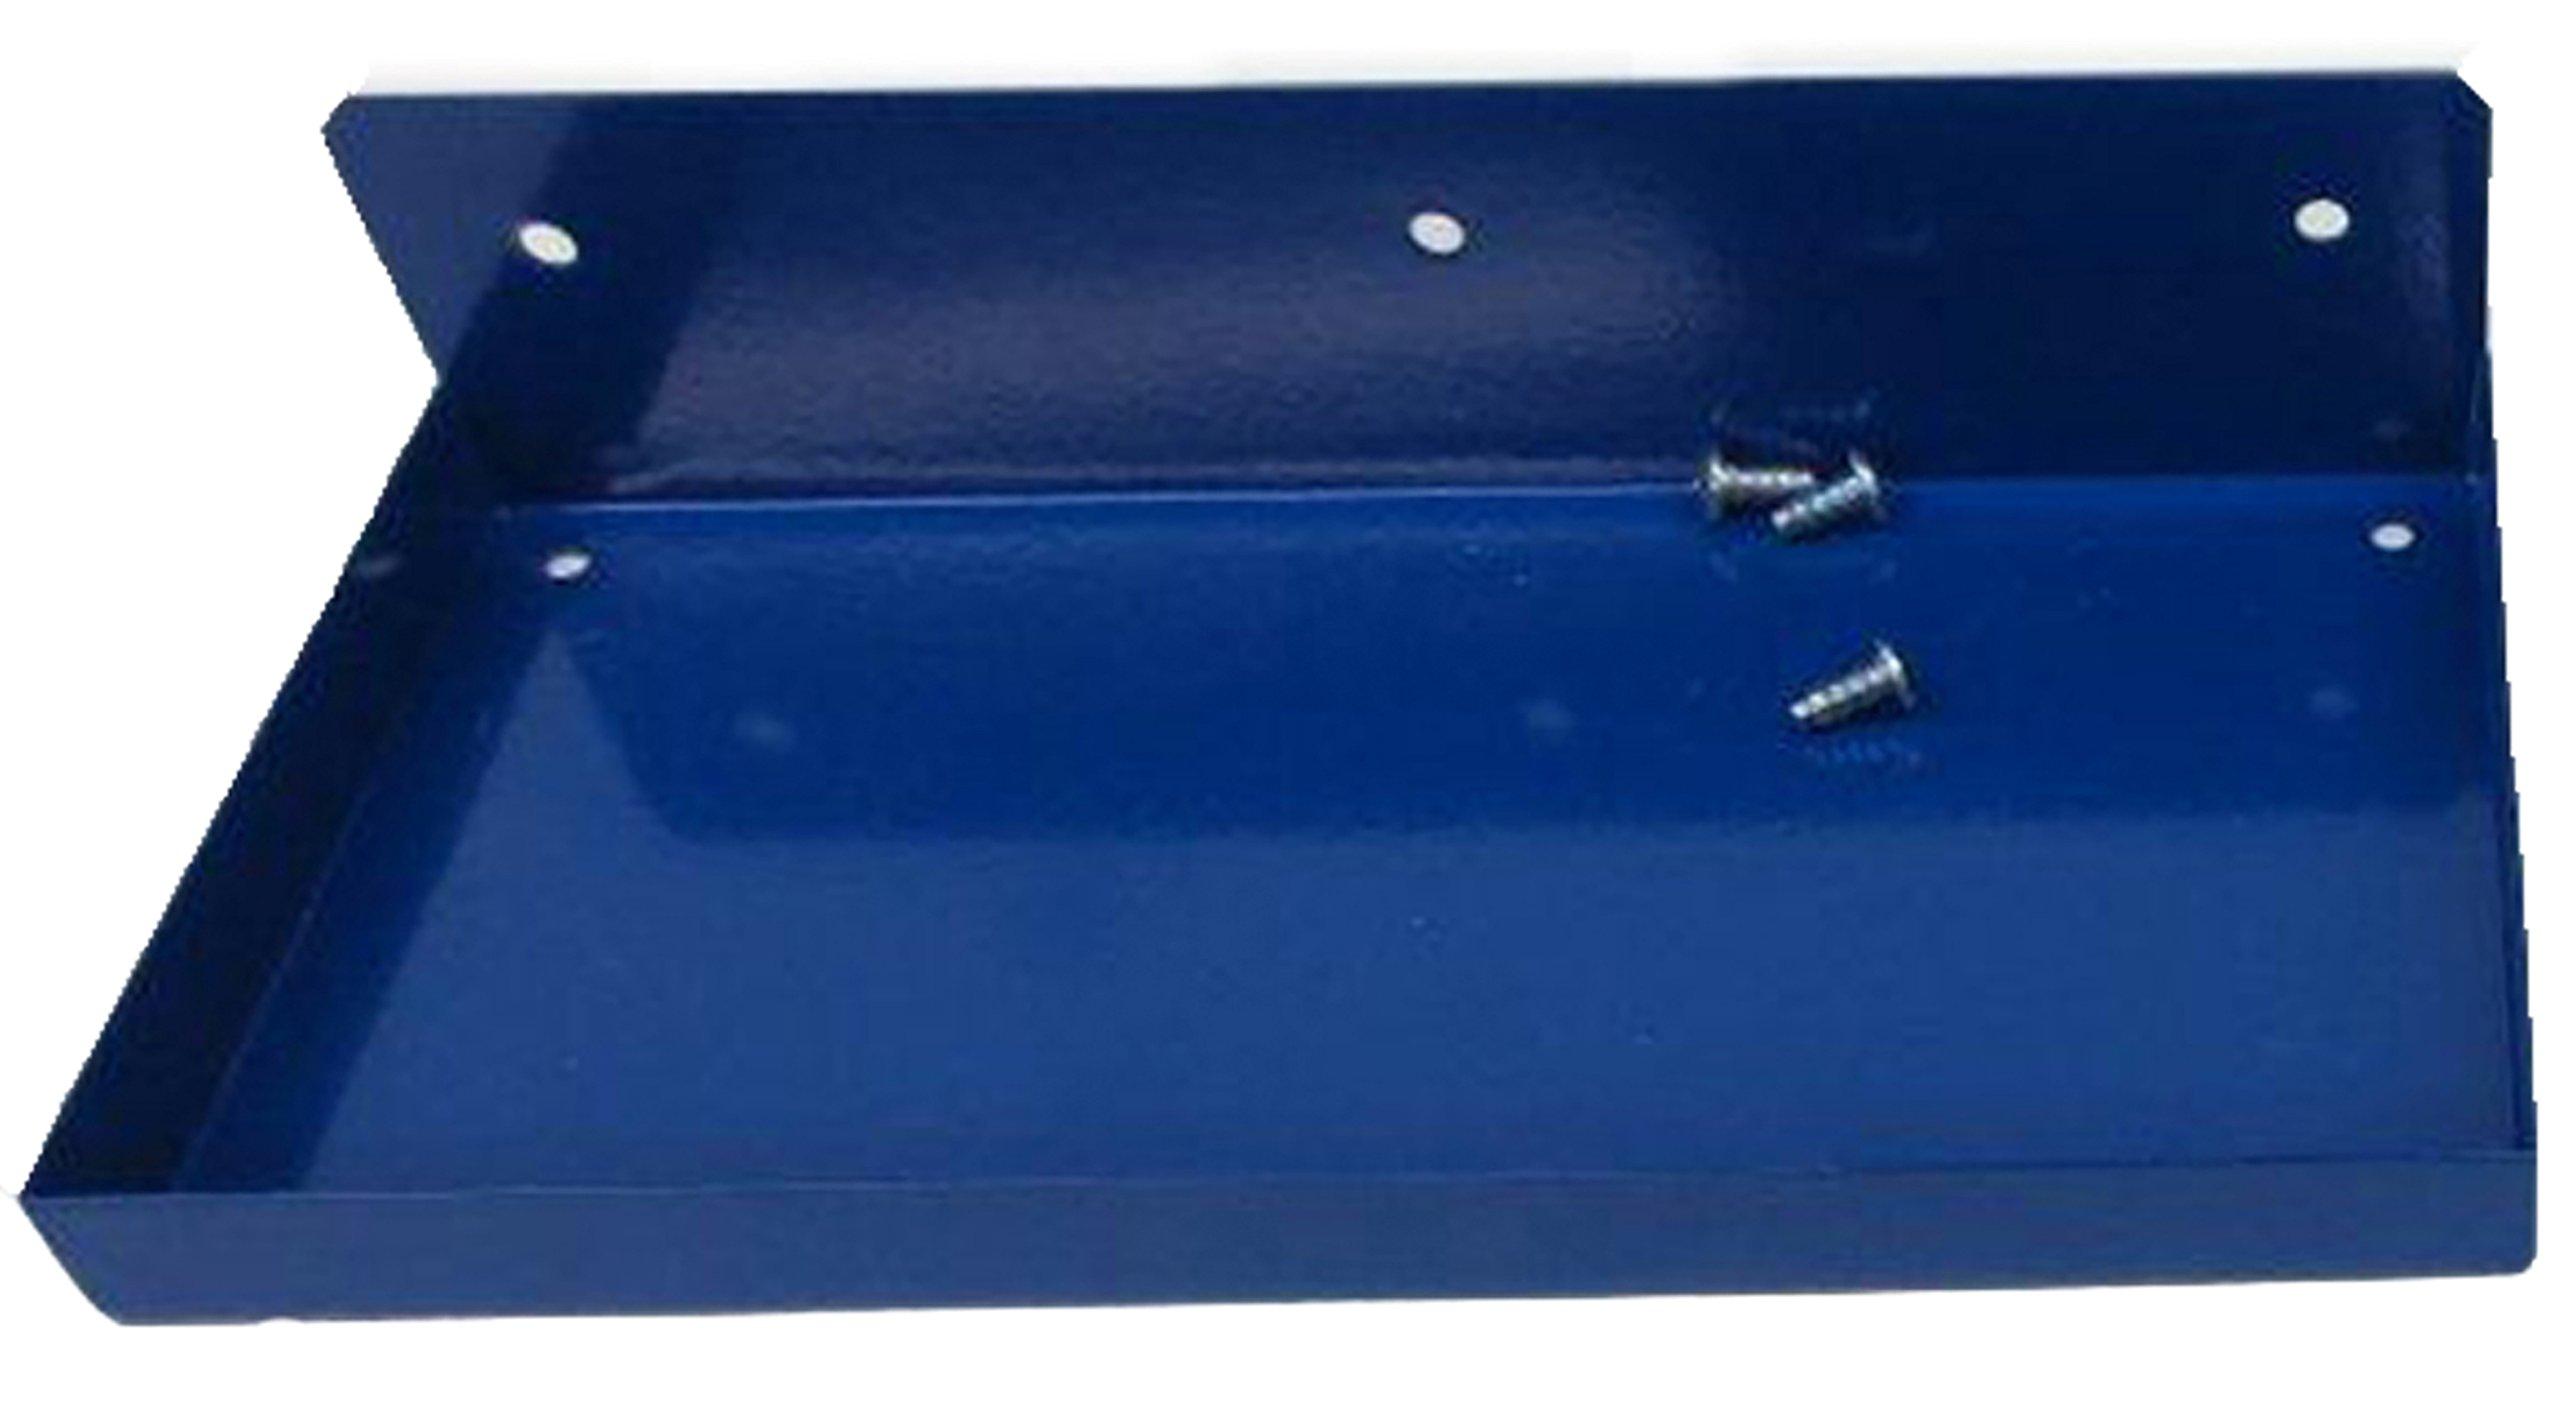 Triton Products 76126 Epoxy Coated Steel Shelf for DuraBoard Pegboard, 12-Inch x 6-Inch, Deep Blue